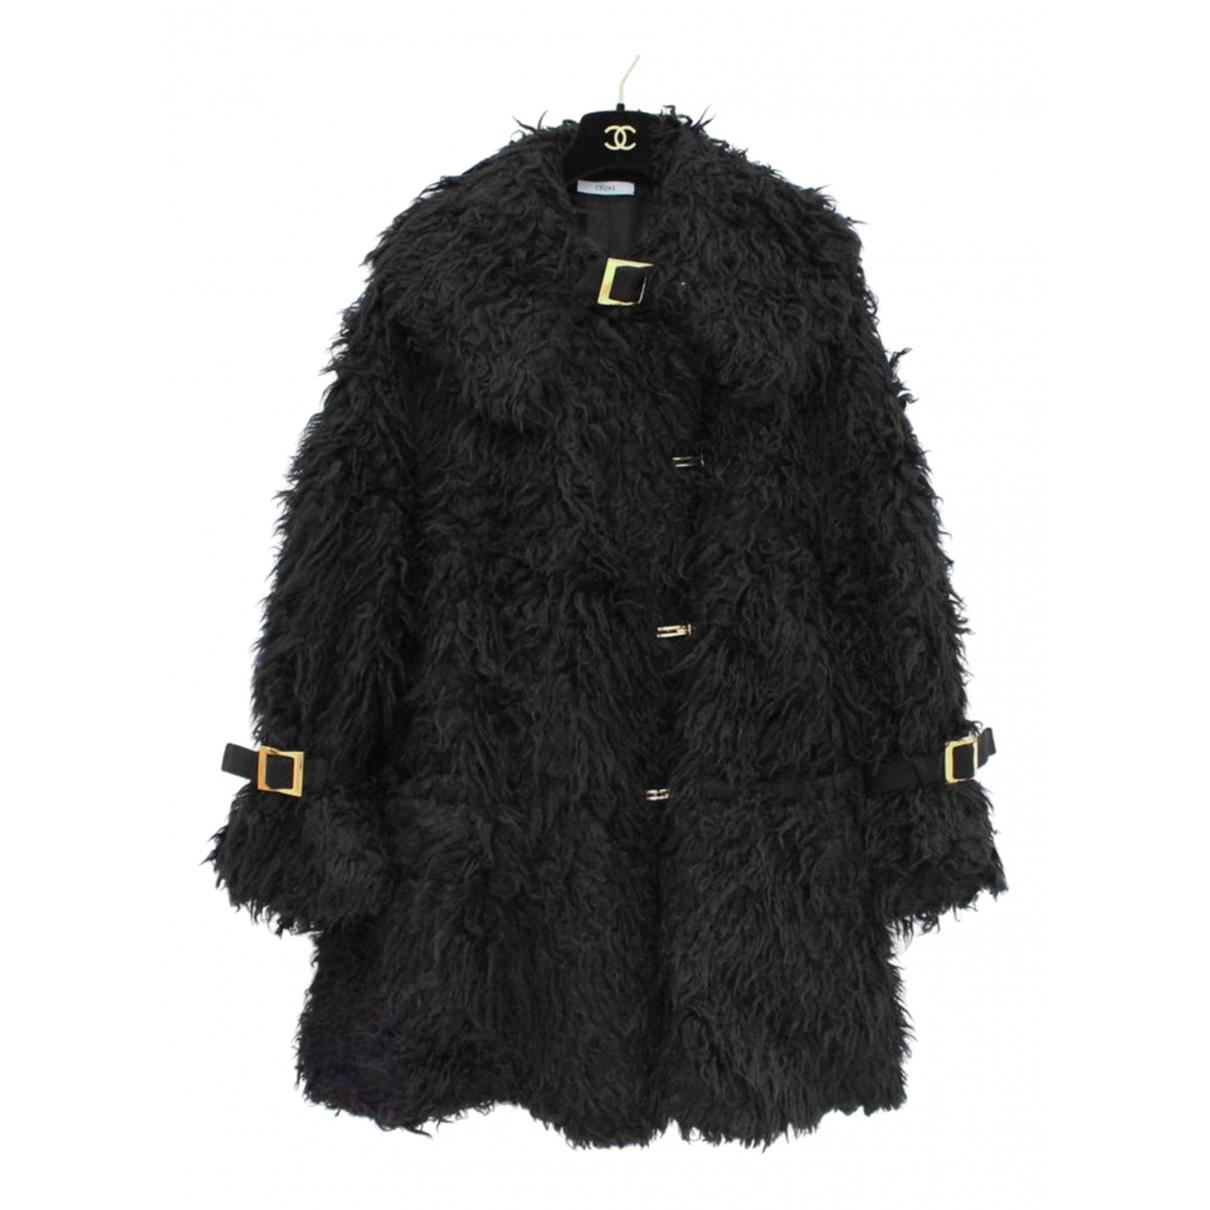 Celine N Black Wool coat for Women 38 FR